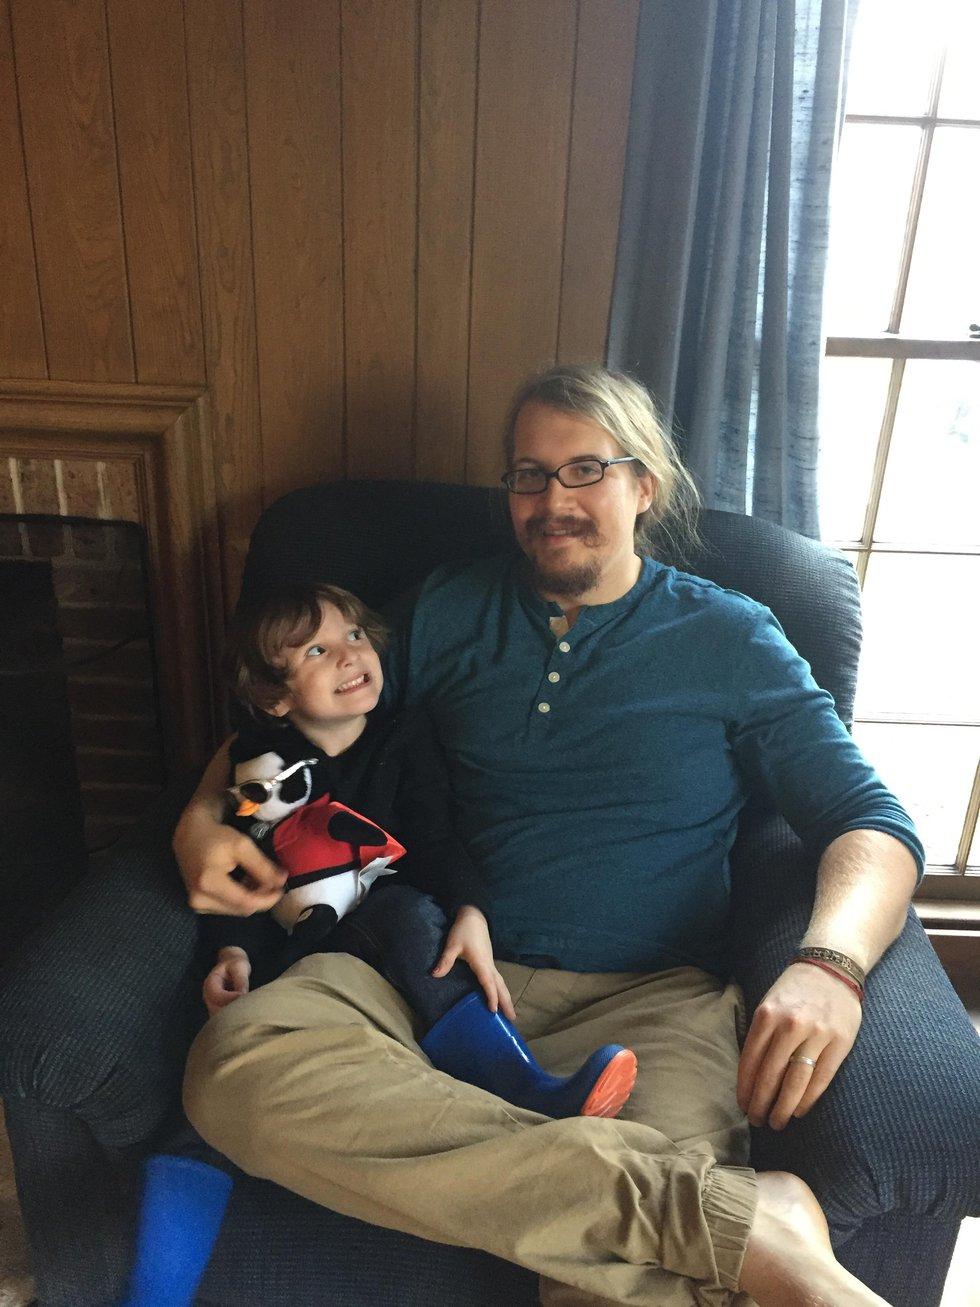 Alex Mixon, robbery victim, sitting with child   (Source-Taylor Mixon)